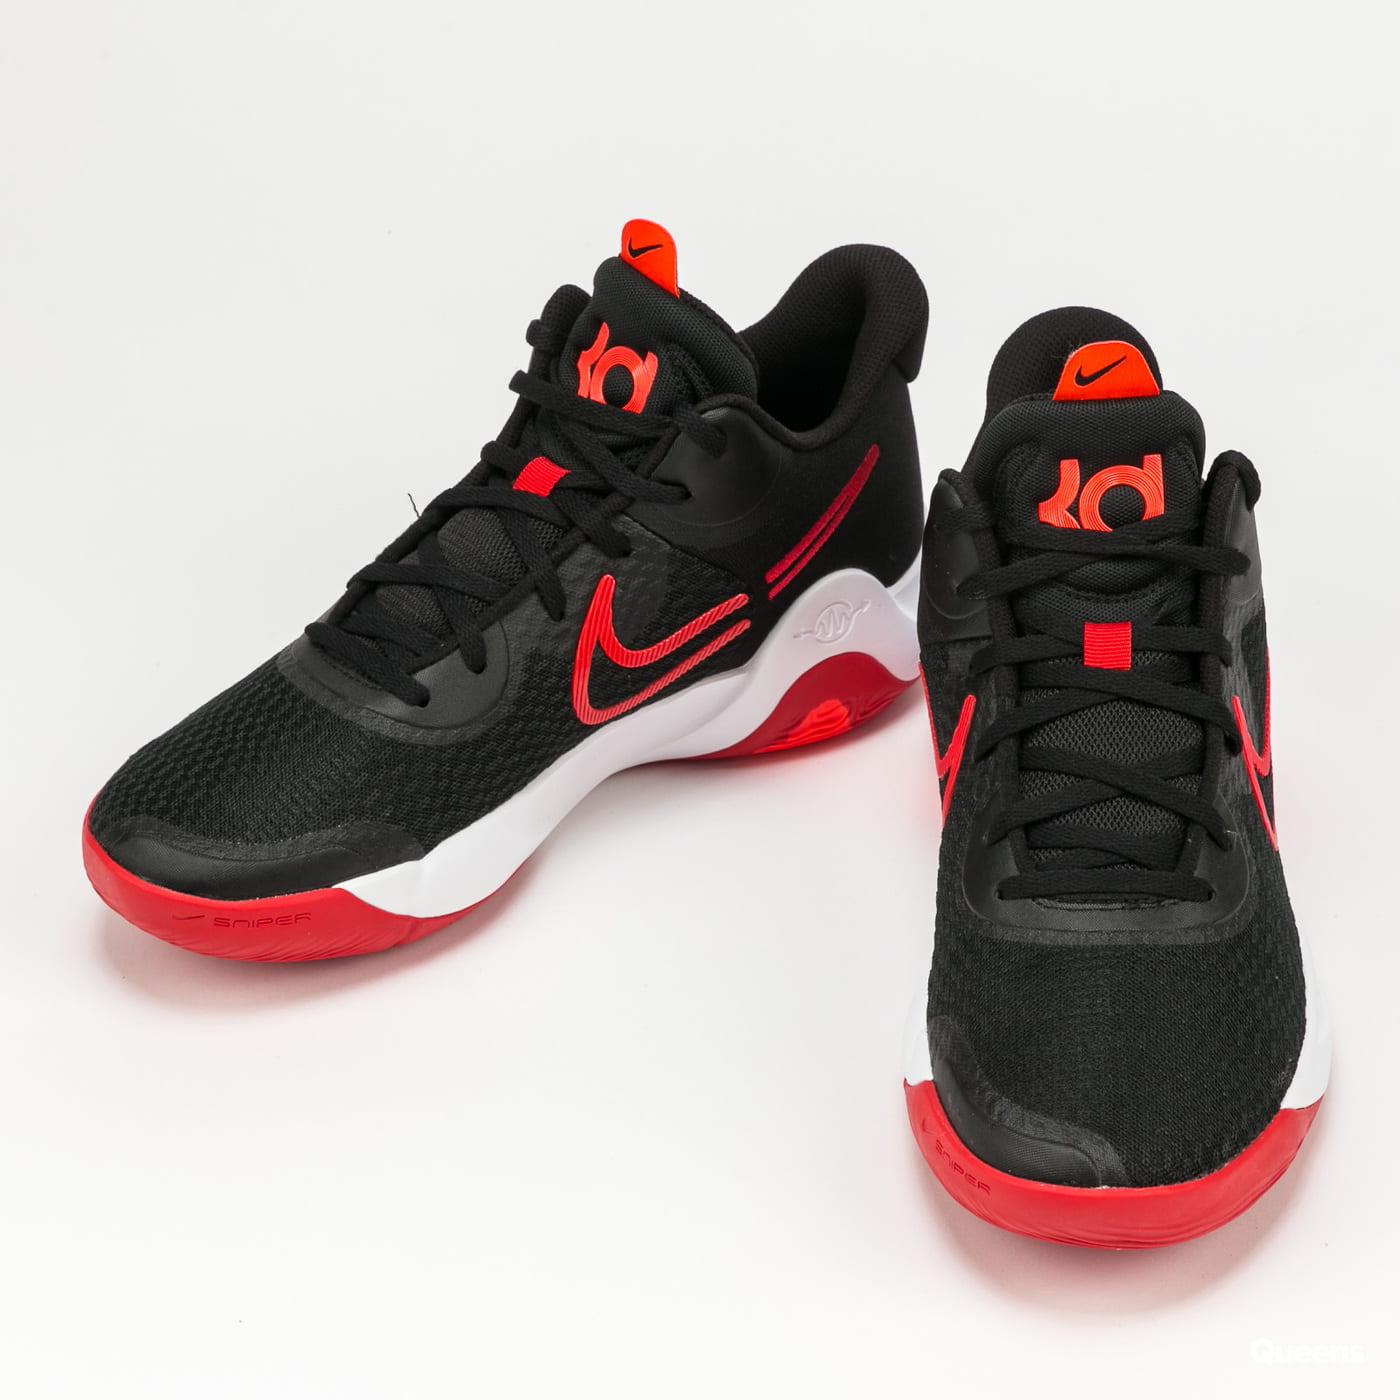 Nike KD Trey 5 IX black / university red - white